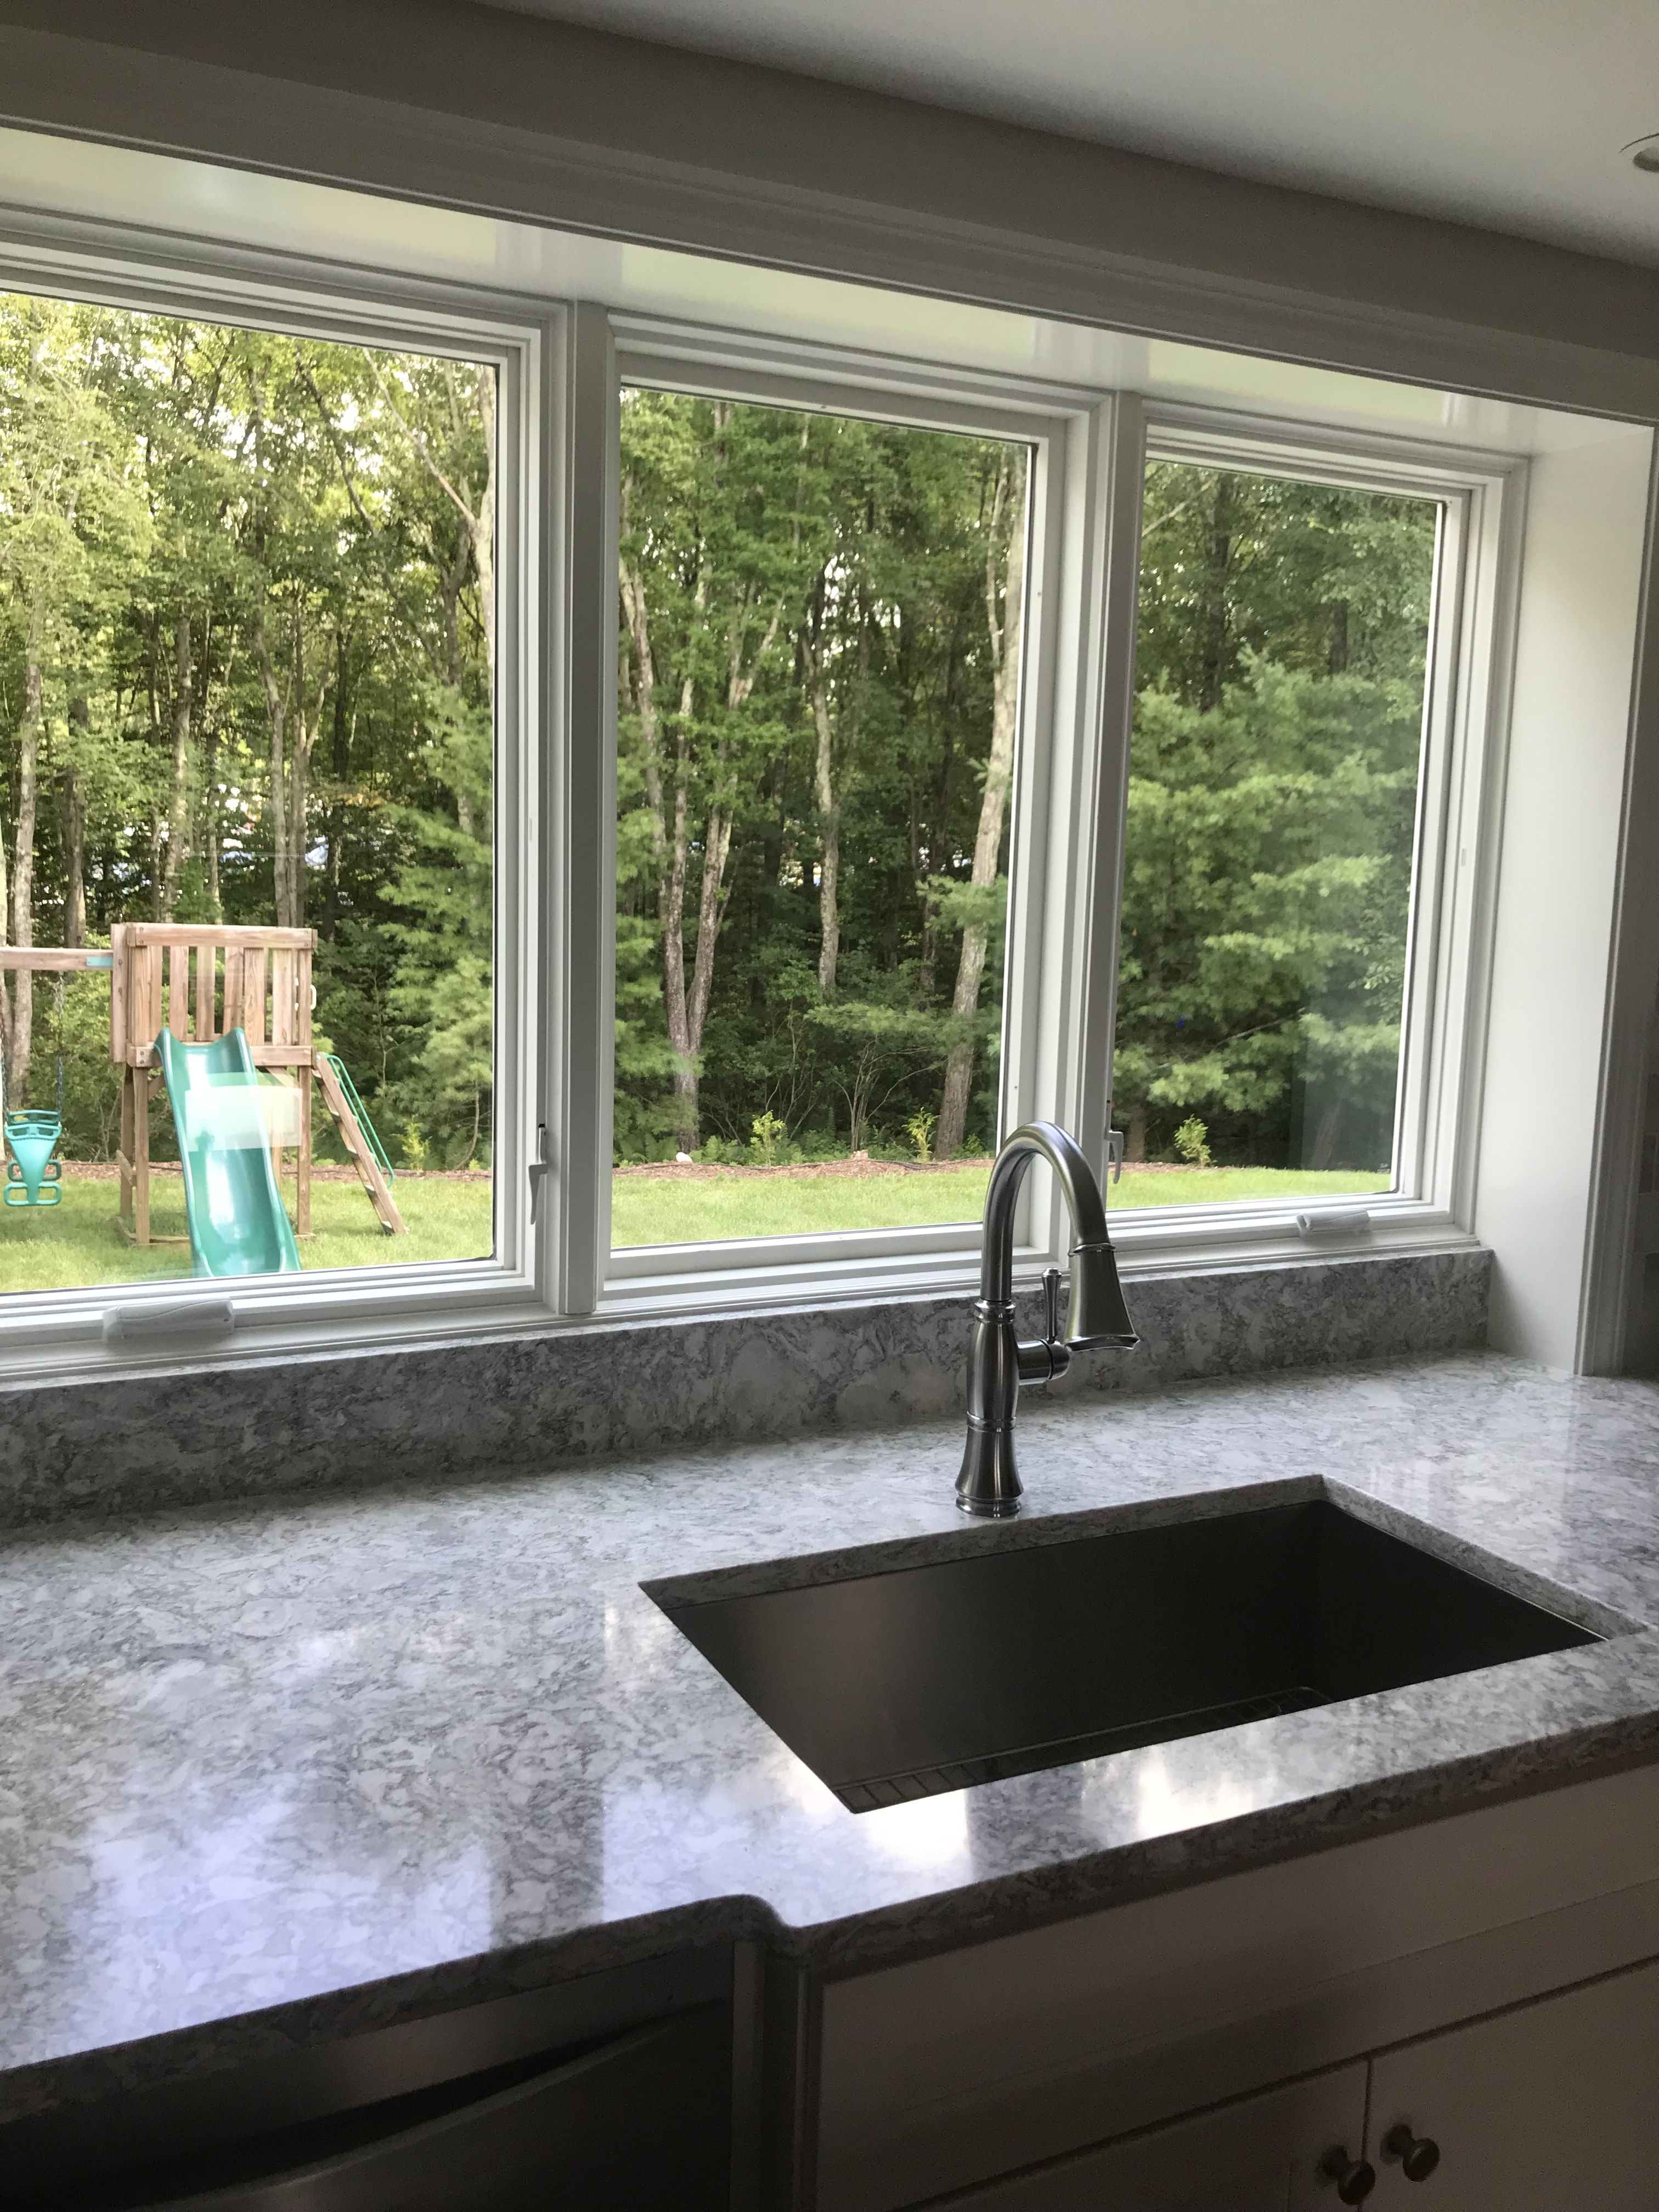 Berwyn Cambria Kitchen: Our New Kitchen Remodel! Cambria Berwyn Quartz, Delta